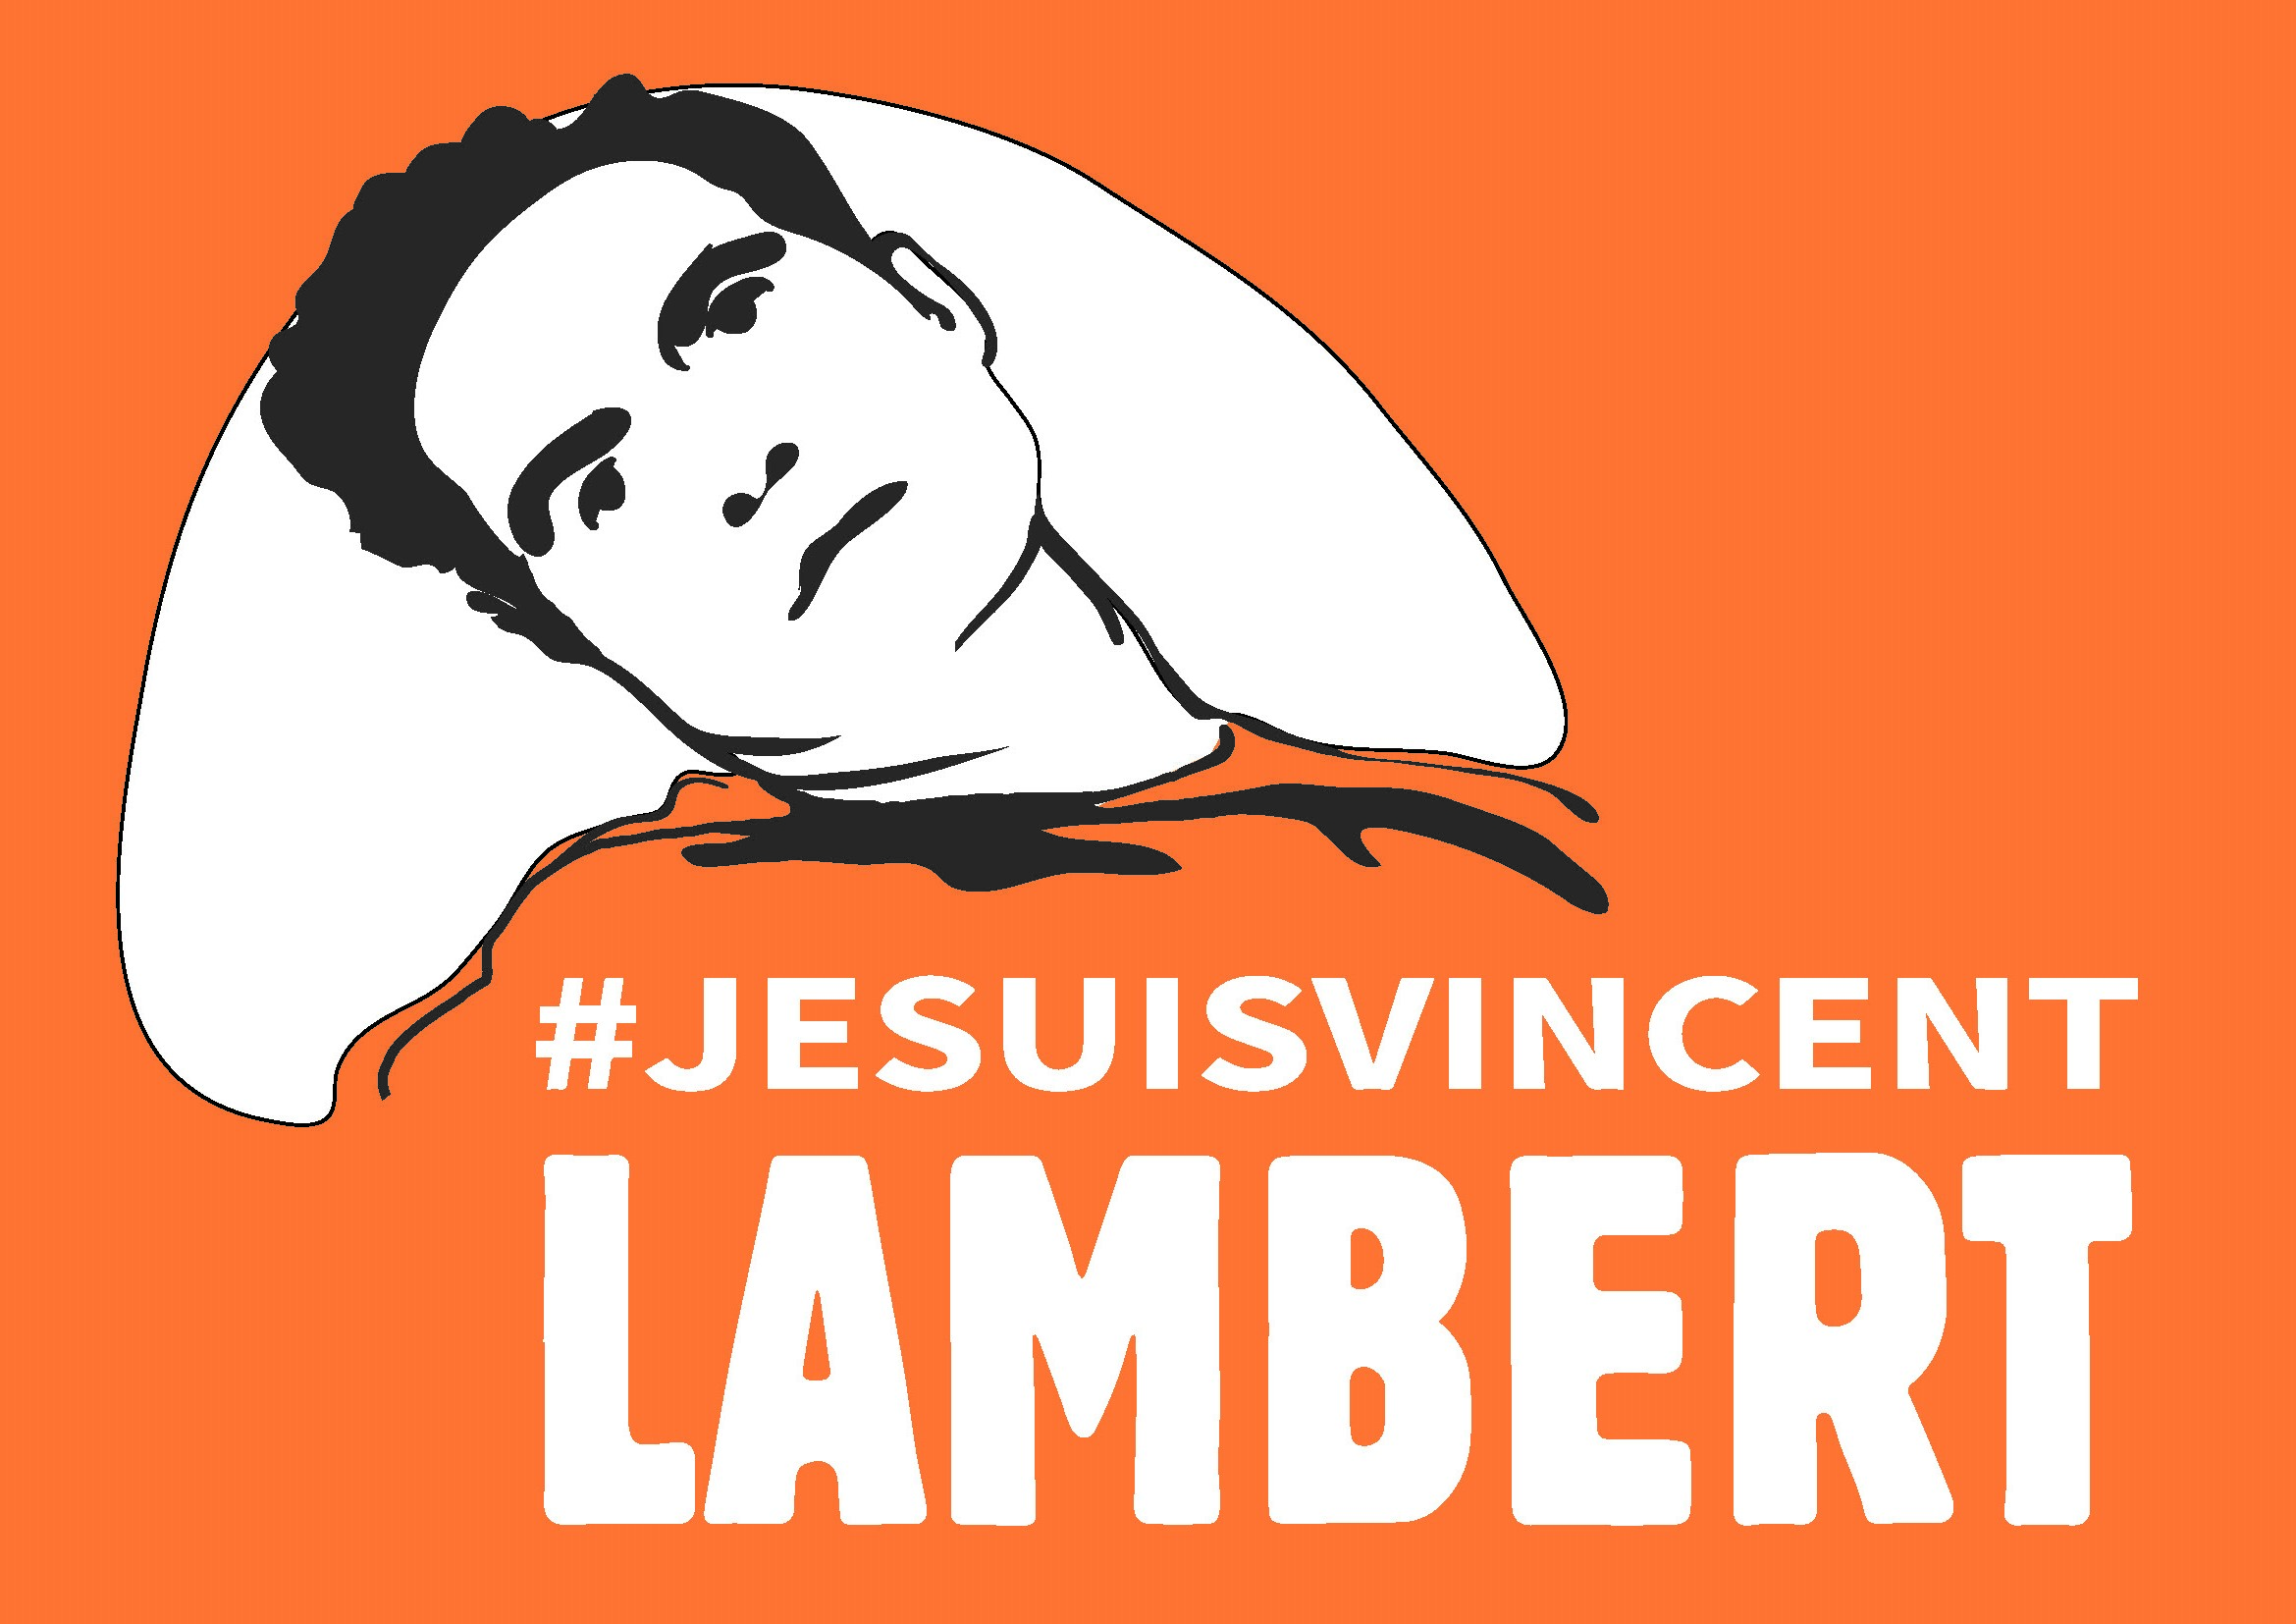 Vincent Lambert morirà di fame e di sete